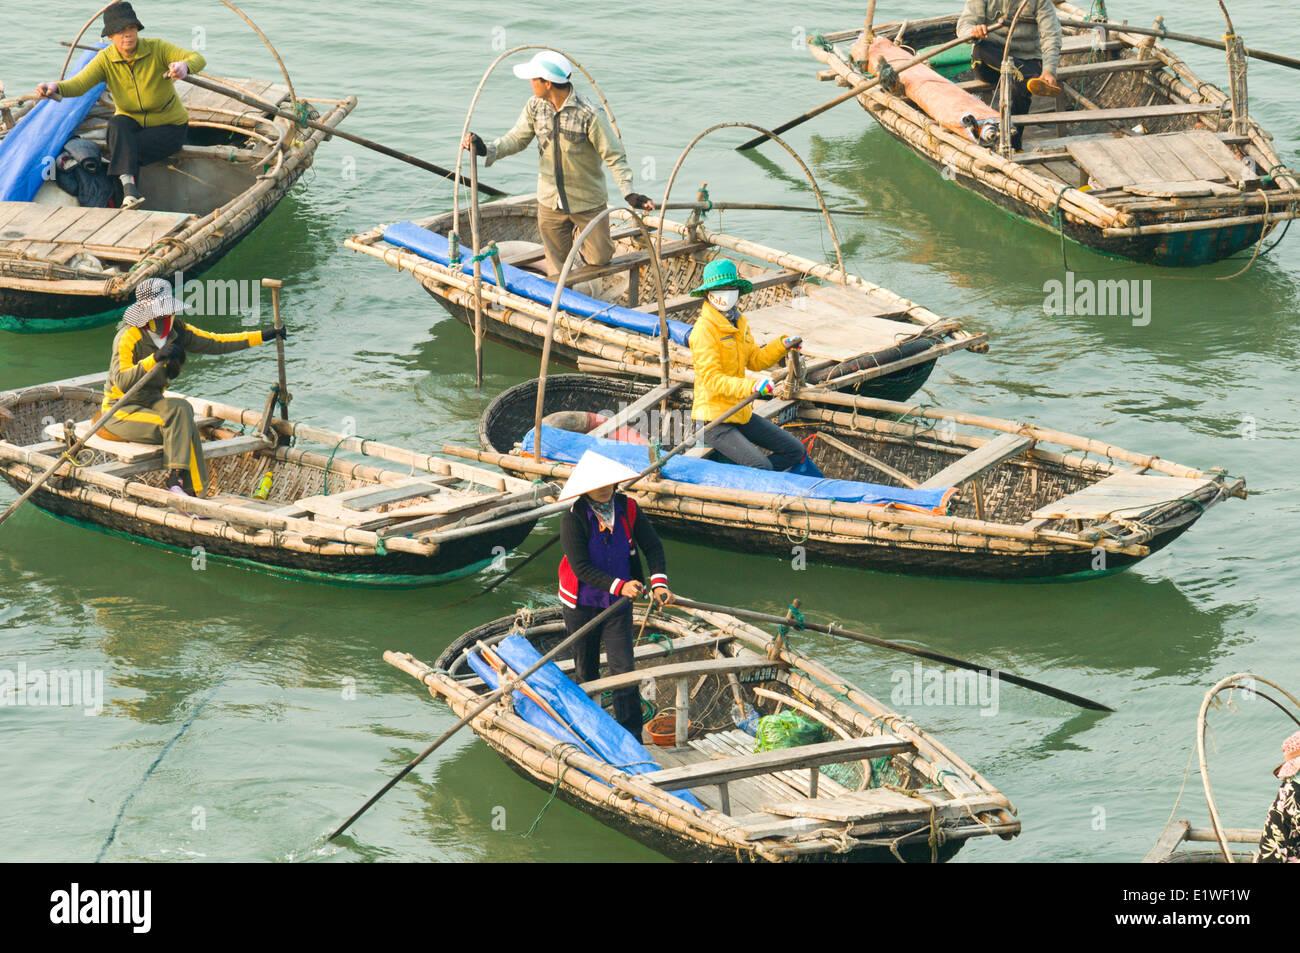 Un floatilla de barcos taxis esperan pasajeros en Cat Ba, Vietnam Imagen De Stock